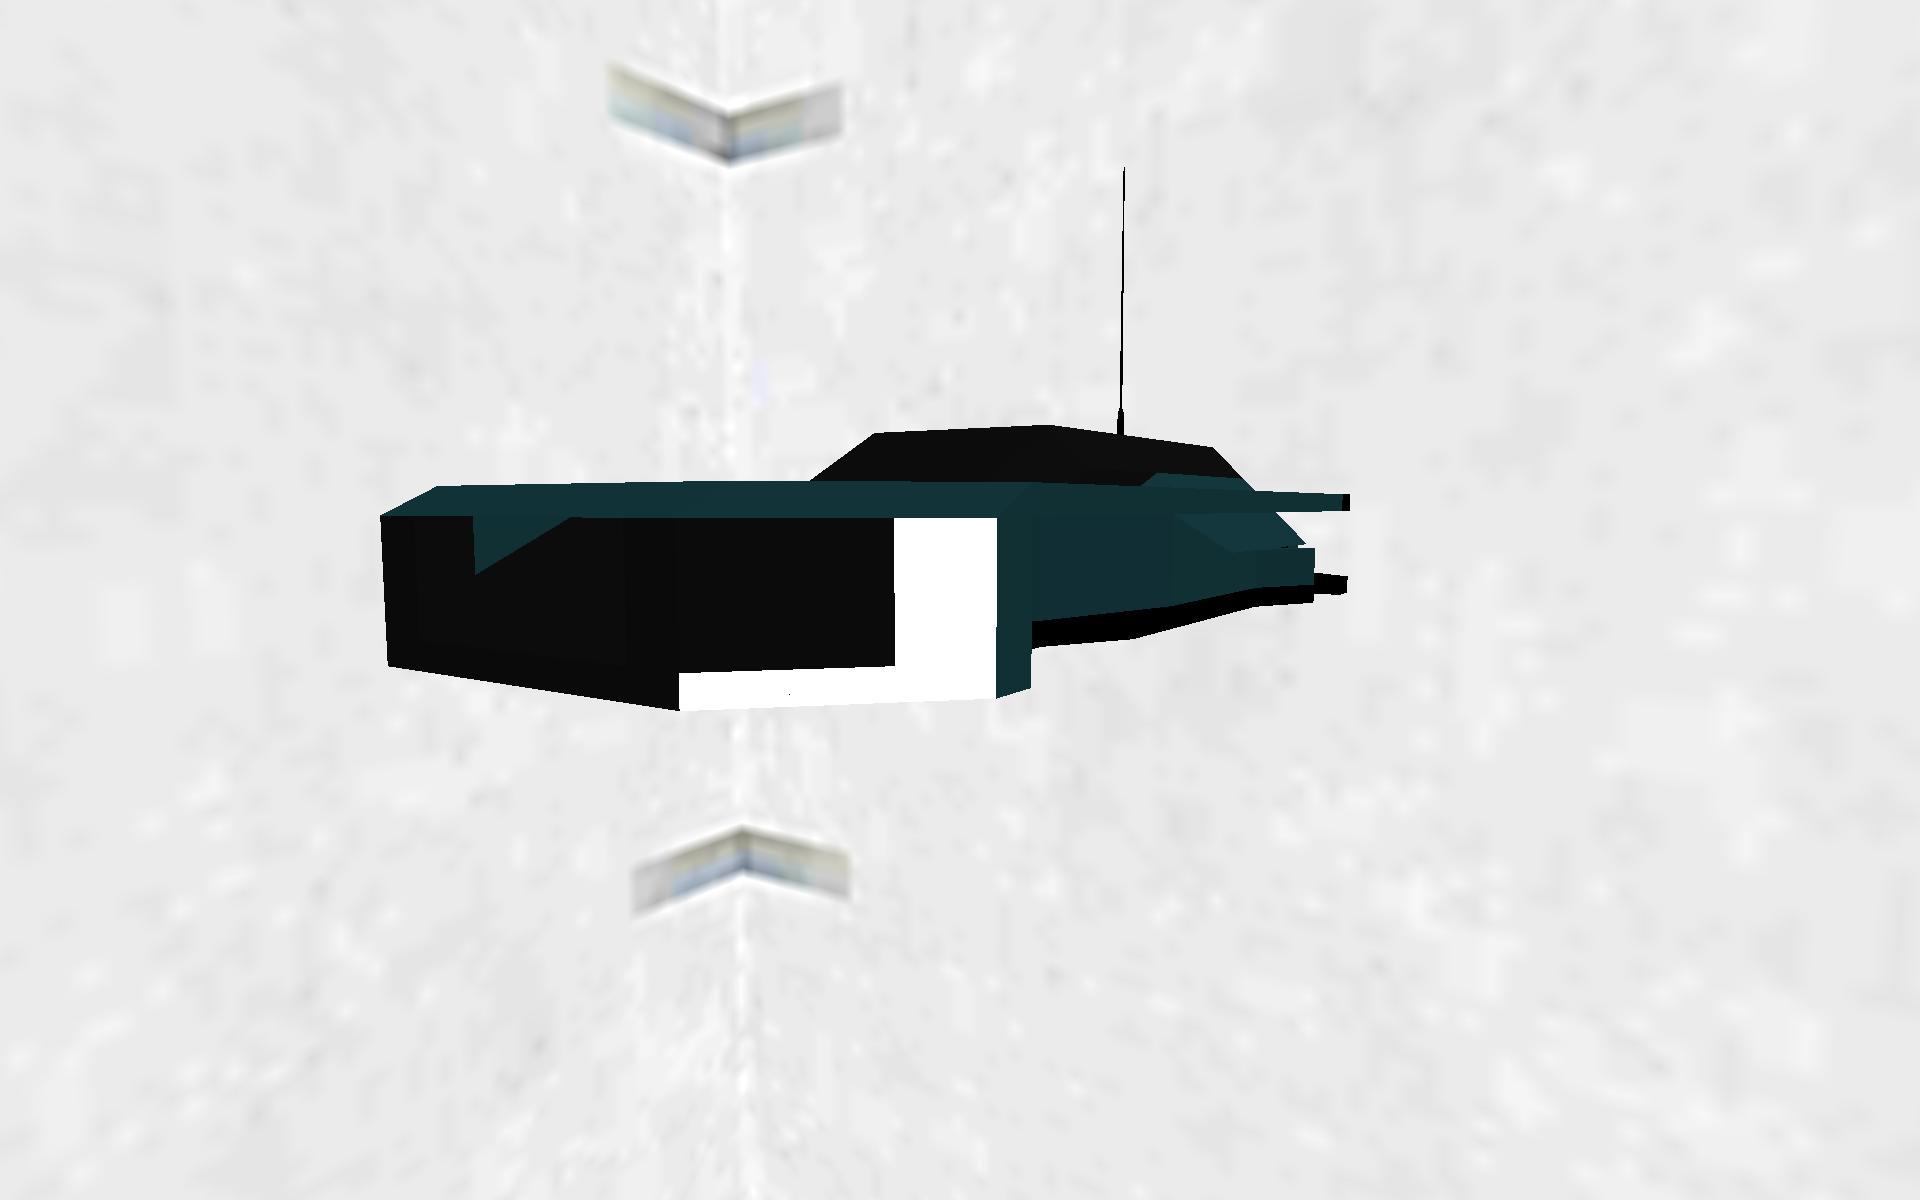 ARX One W20 QUATTRO TURBO